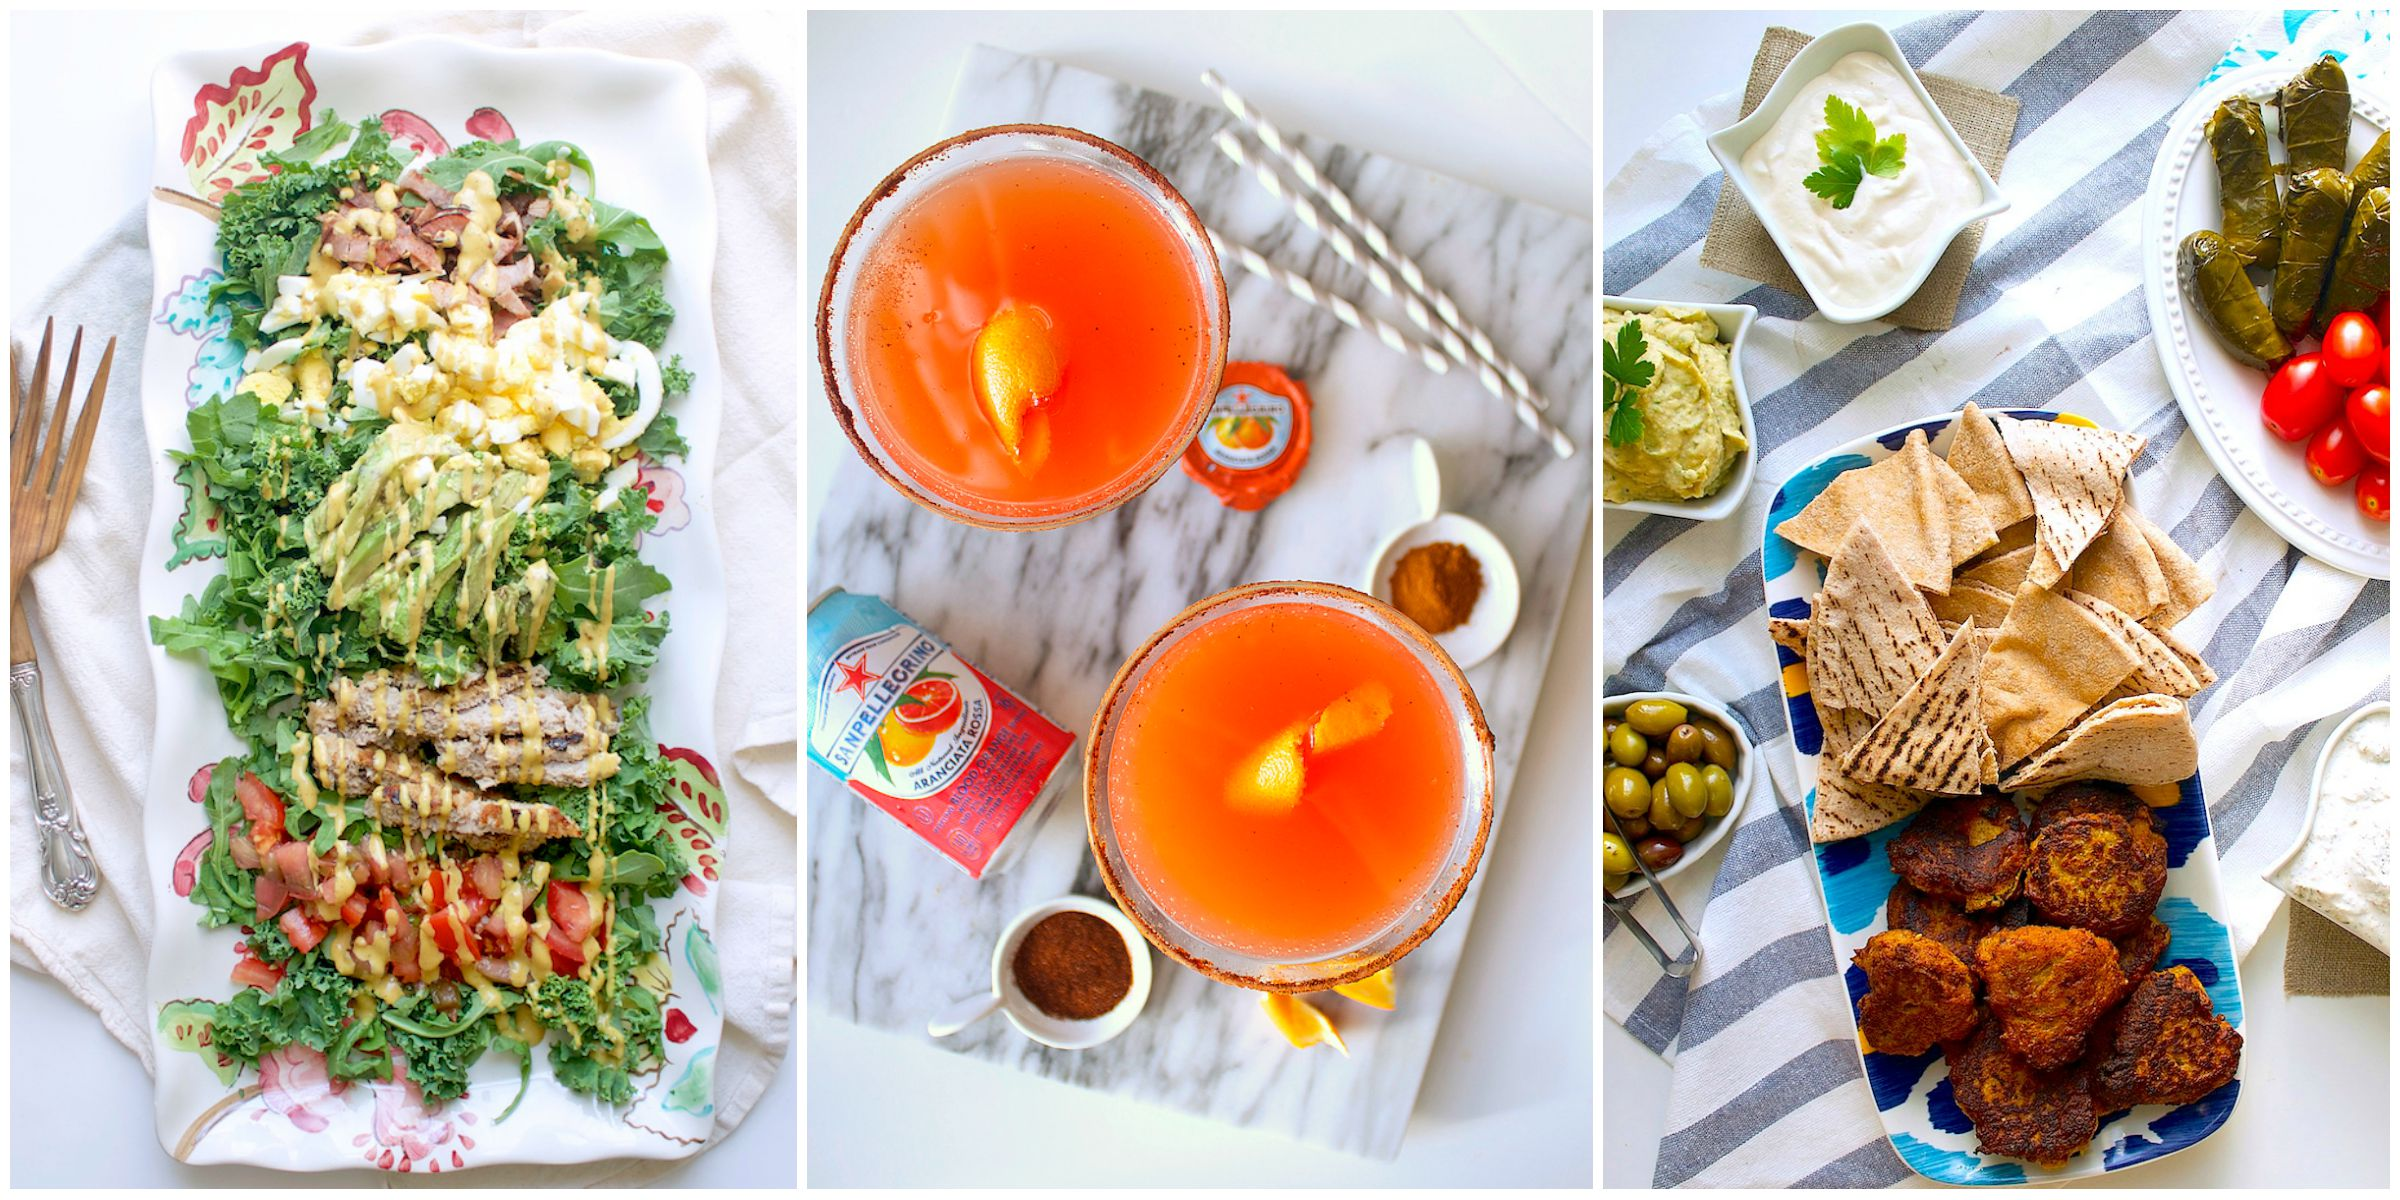 Summer-Food-4.jpg